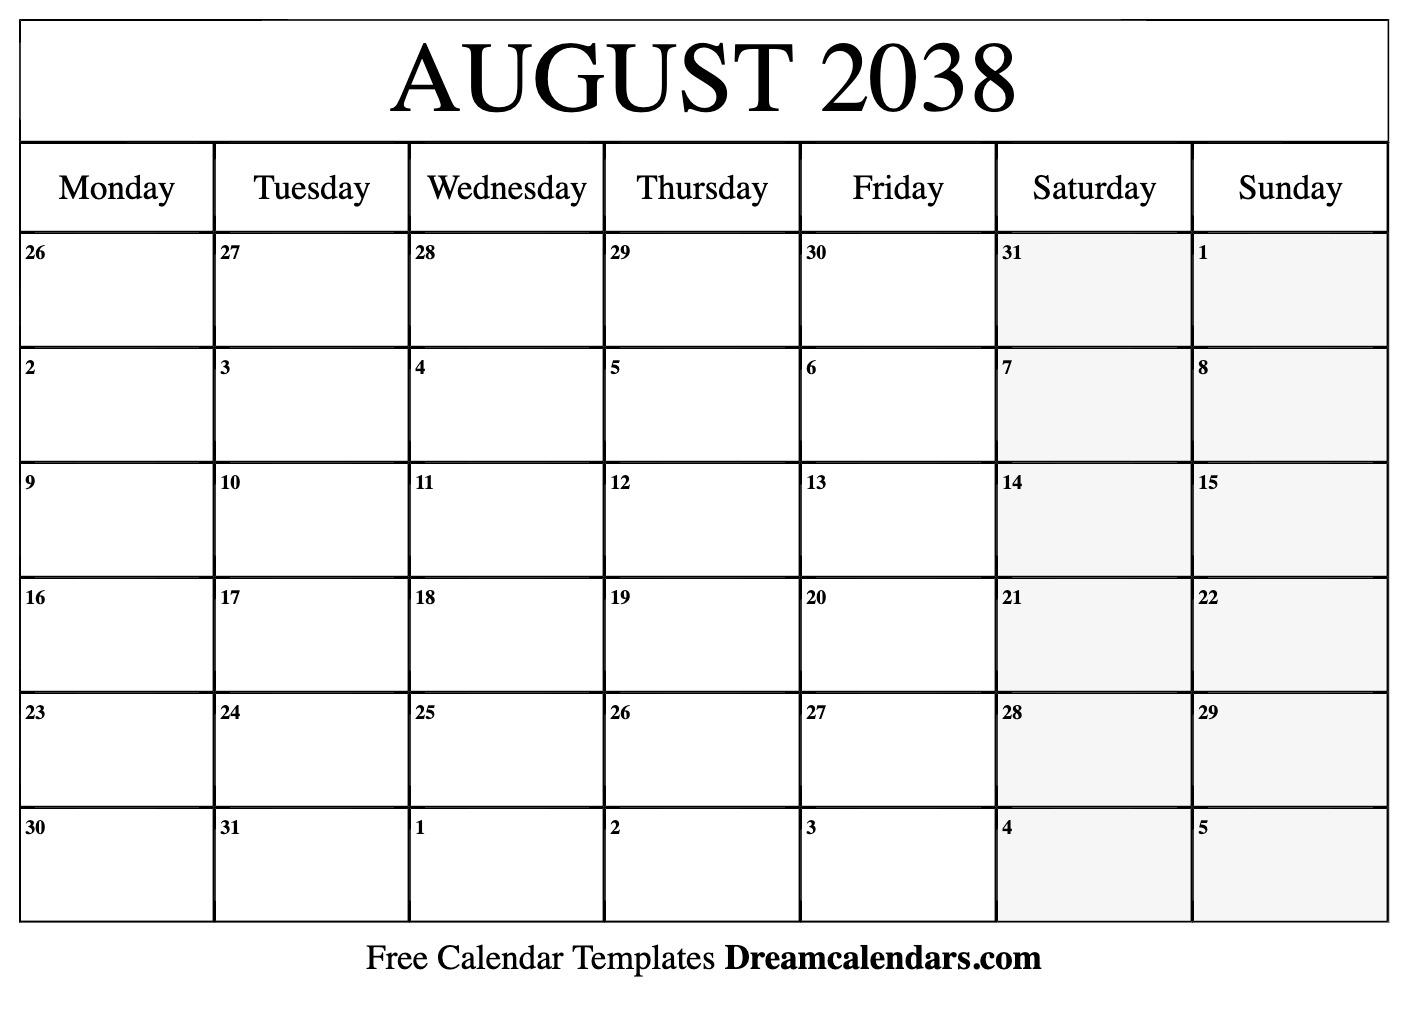 Printable August 2038 Calendar Regarding Printable Sunrise Sunset Times 2021